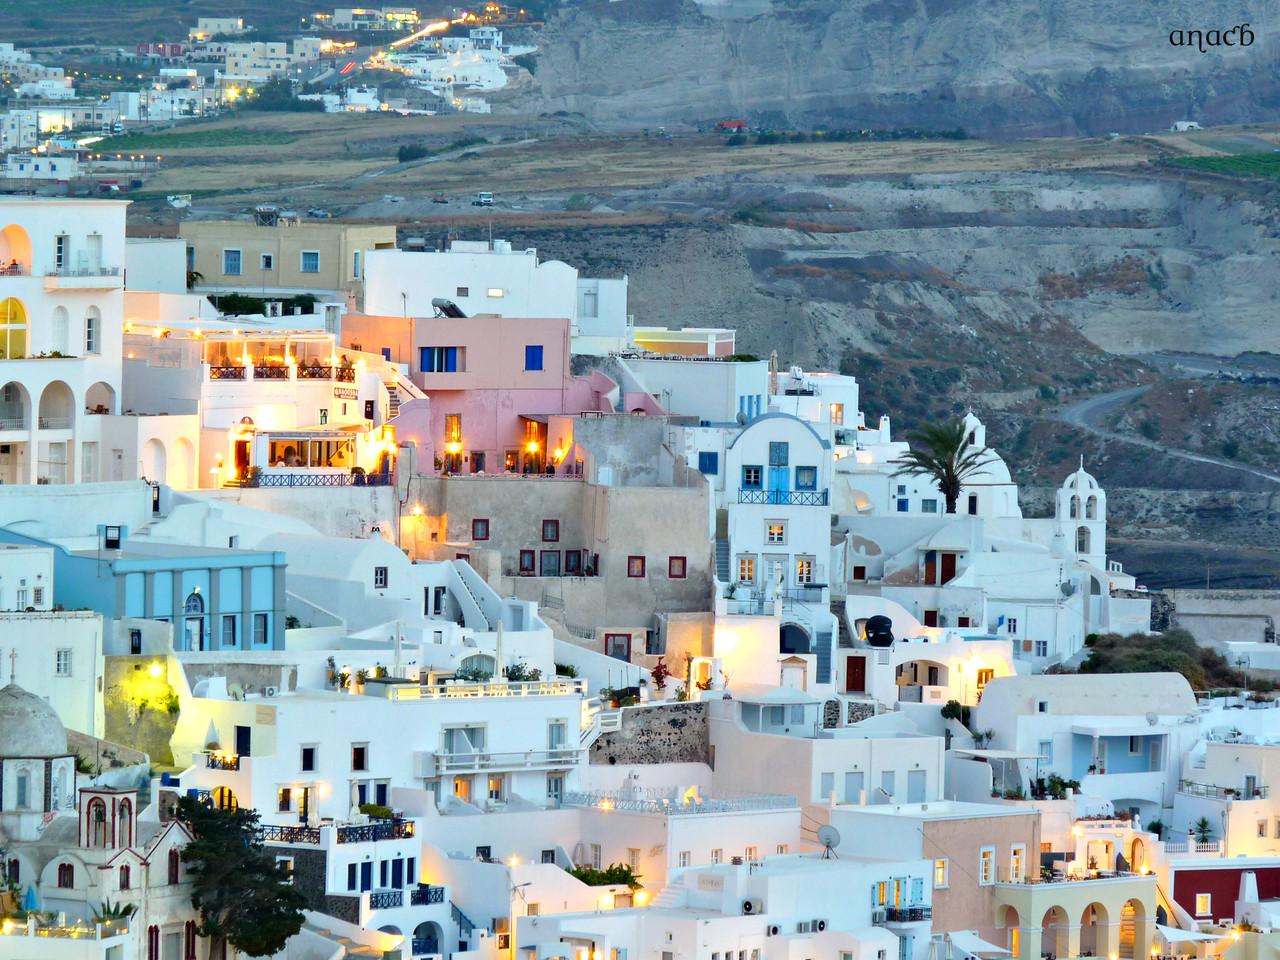 Santorini-Fira (901) cópia assin.jpg